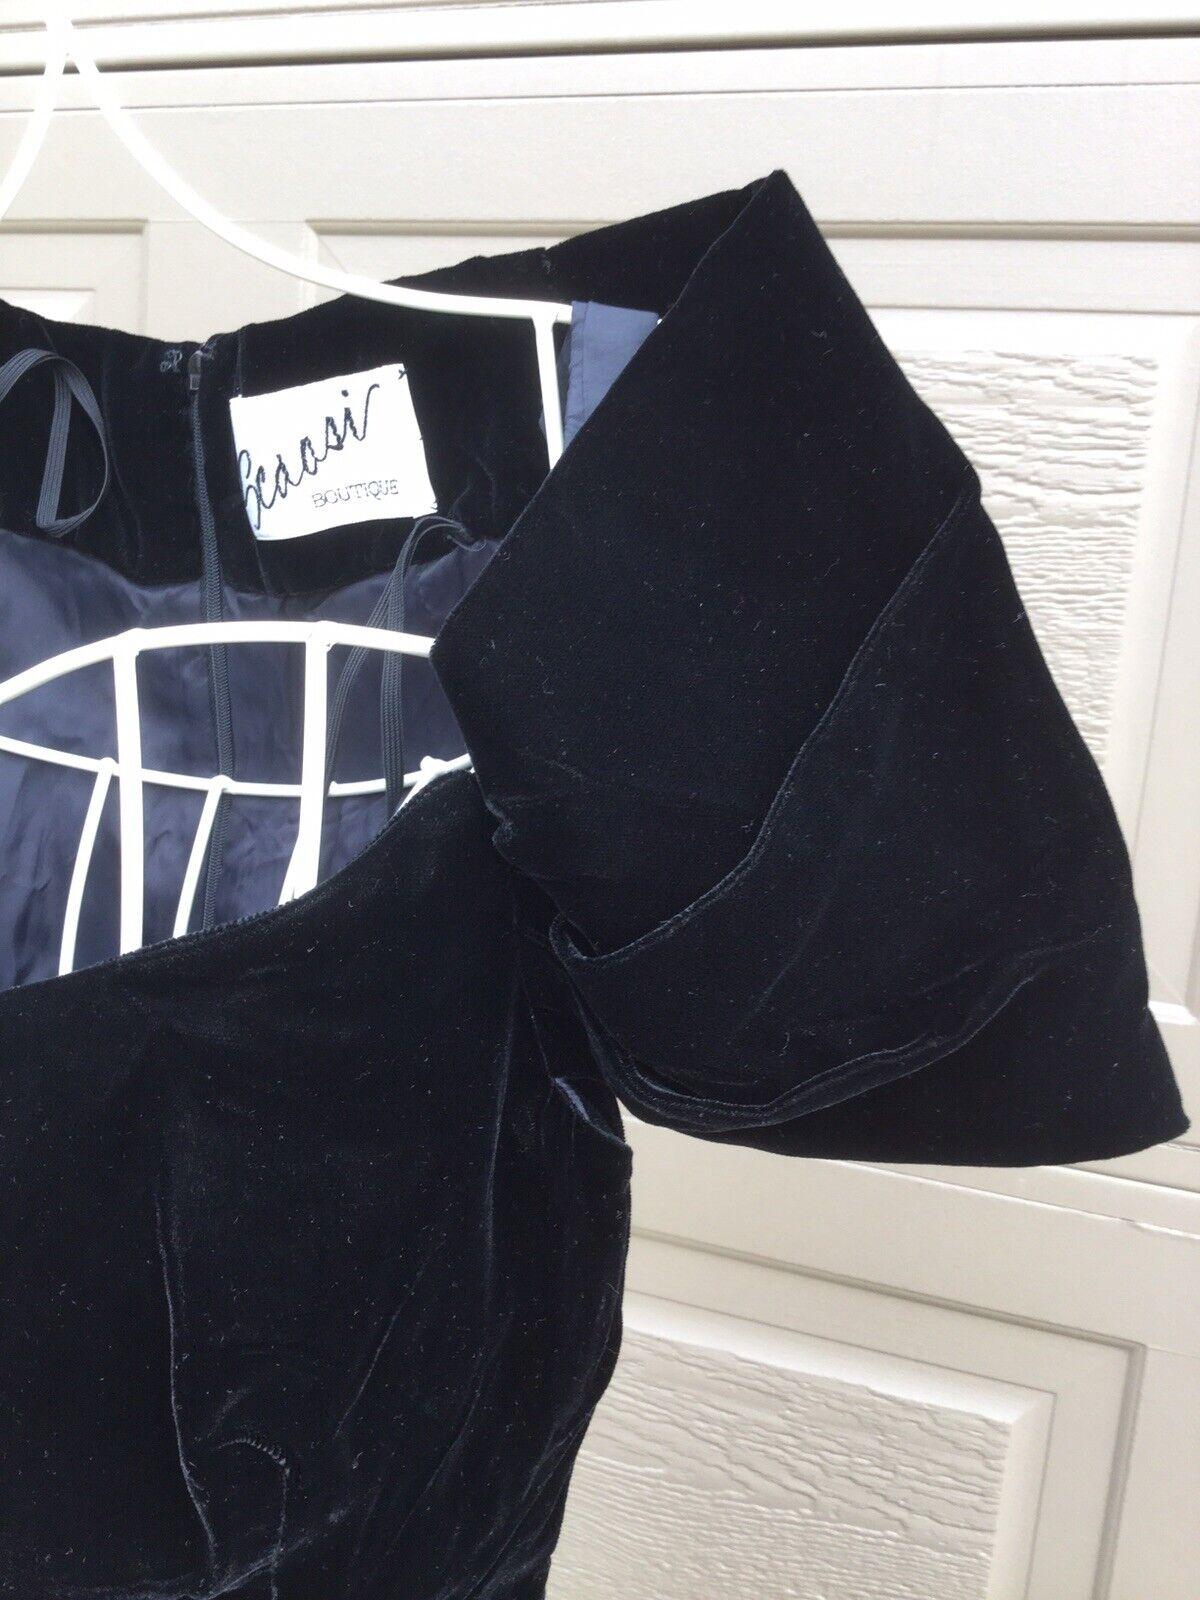 Scaasi Boutique Couture Black Velvet Satin Dress,… - image 4